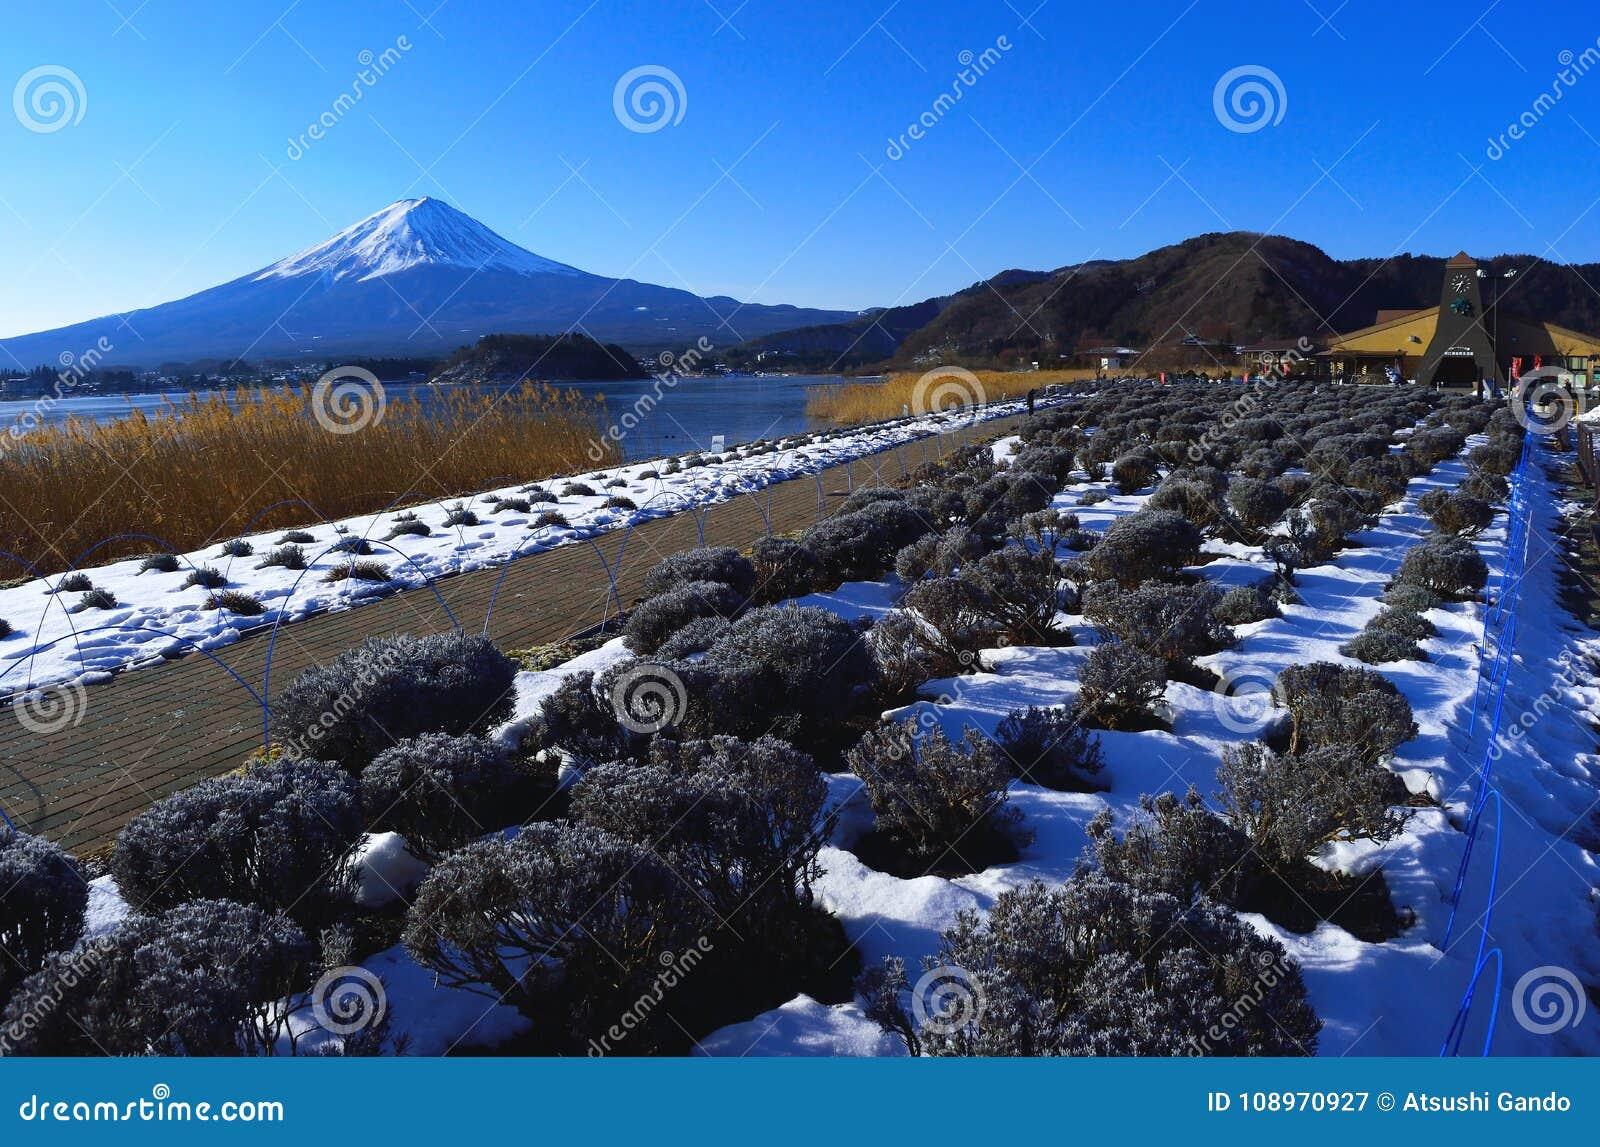 Mount Fuji of winter scene from Lake Kawaguchi Japan